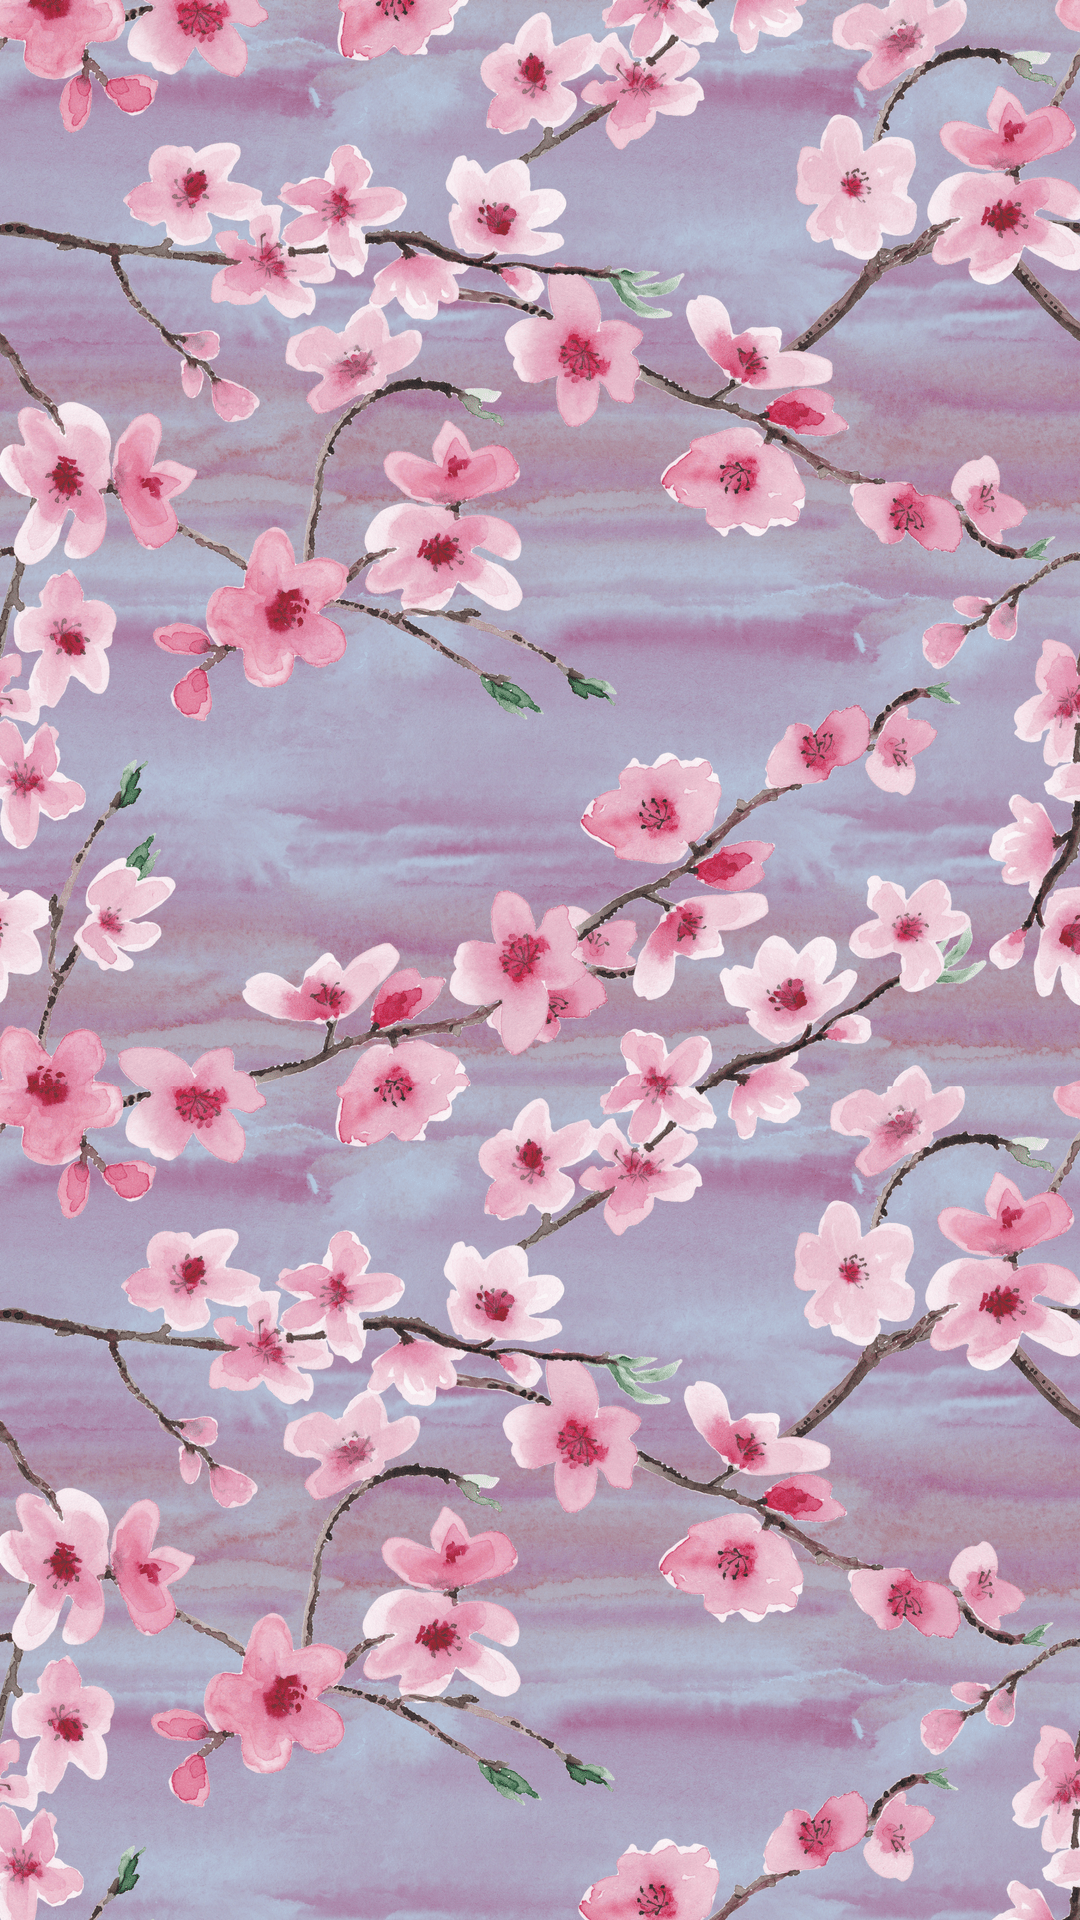 Cherry Blossom Smart Phone Wallpaper Cherry Blossom Wallpaper Cherry Blossom Wallpaper Iphone Floral Wallpaper Iphone